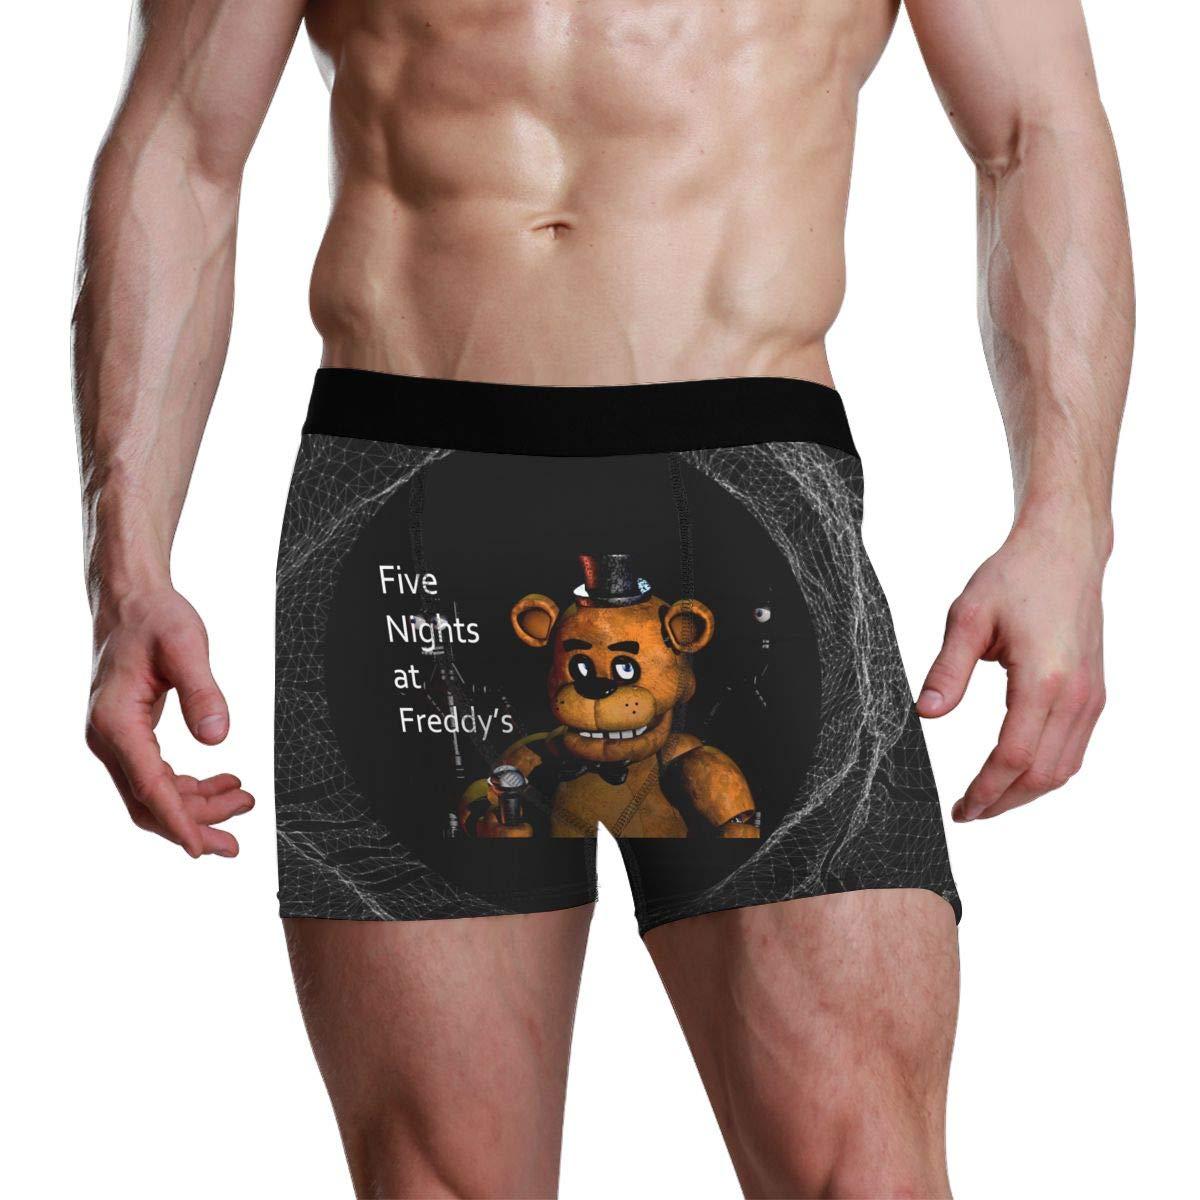 LixuA Big Boys Five-Nights-at-Freddys Cotton Underwear Stretch Trunks Boxer Briefs